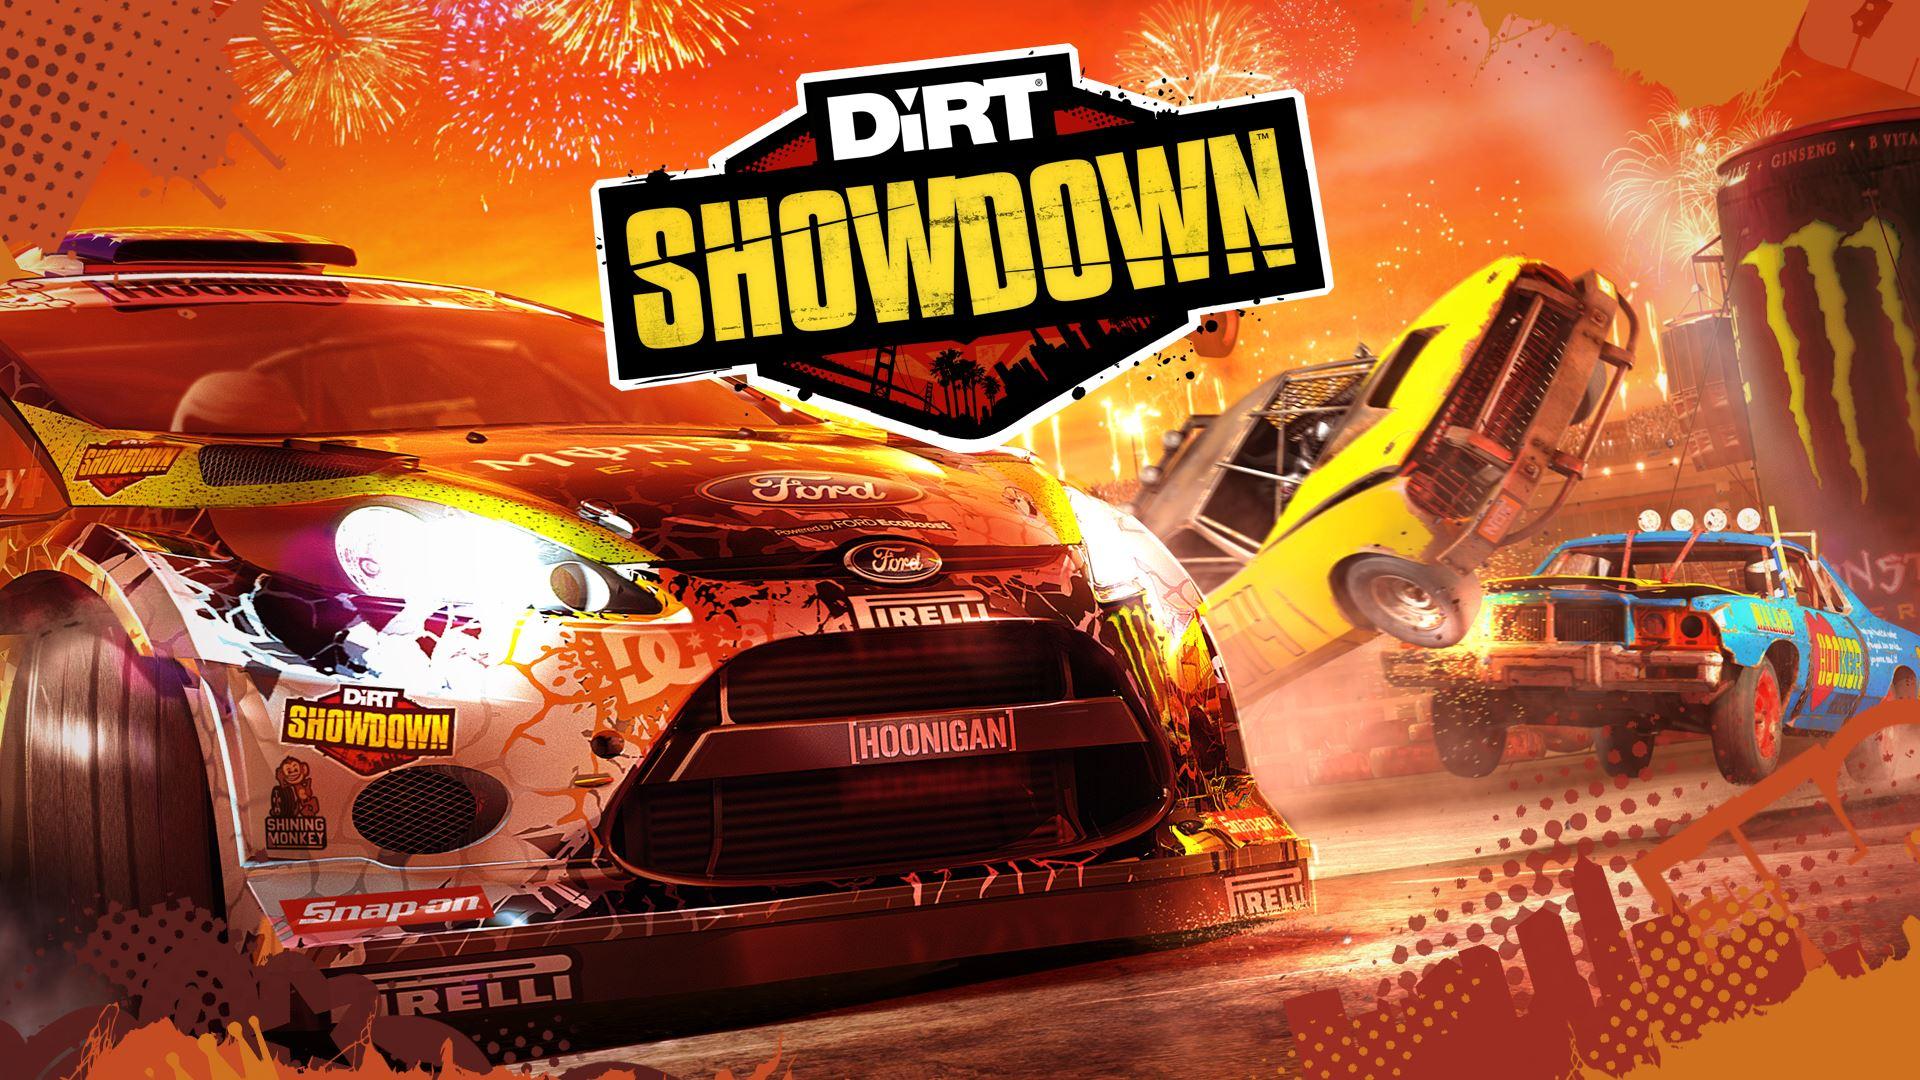 Dirt Showdown review